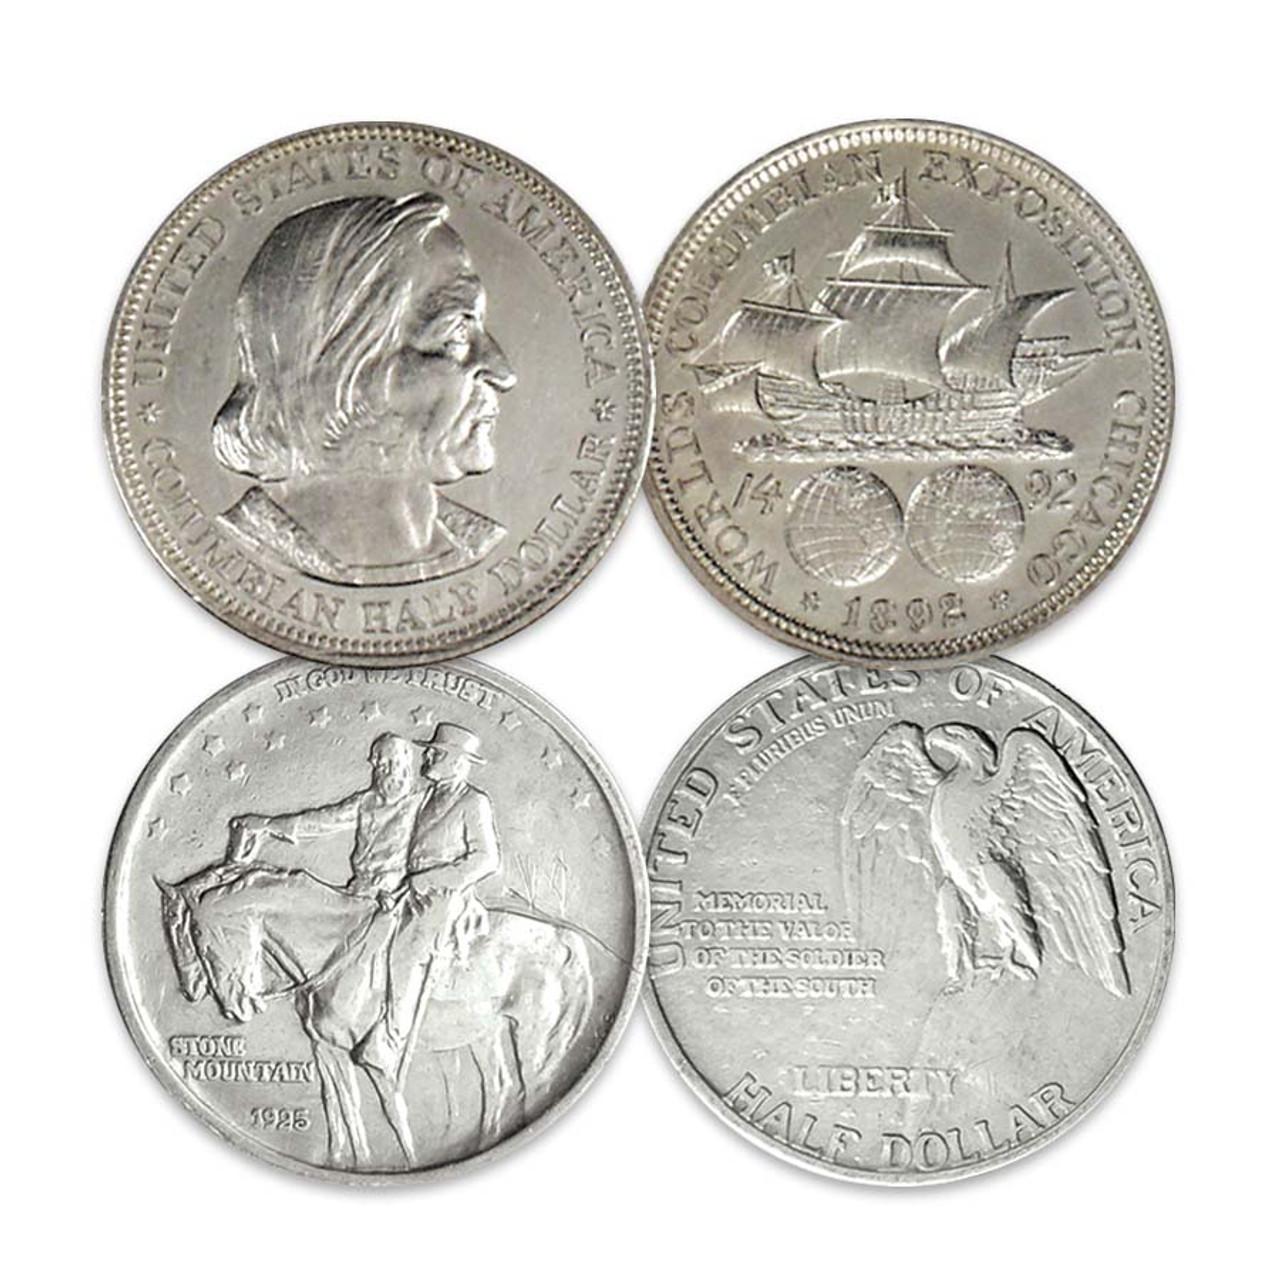 1892 Columbus Half Dollar Extra Fine & 1925 Stone Mountain Half Dollar Very Fine Pair